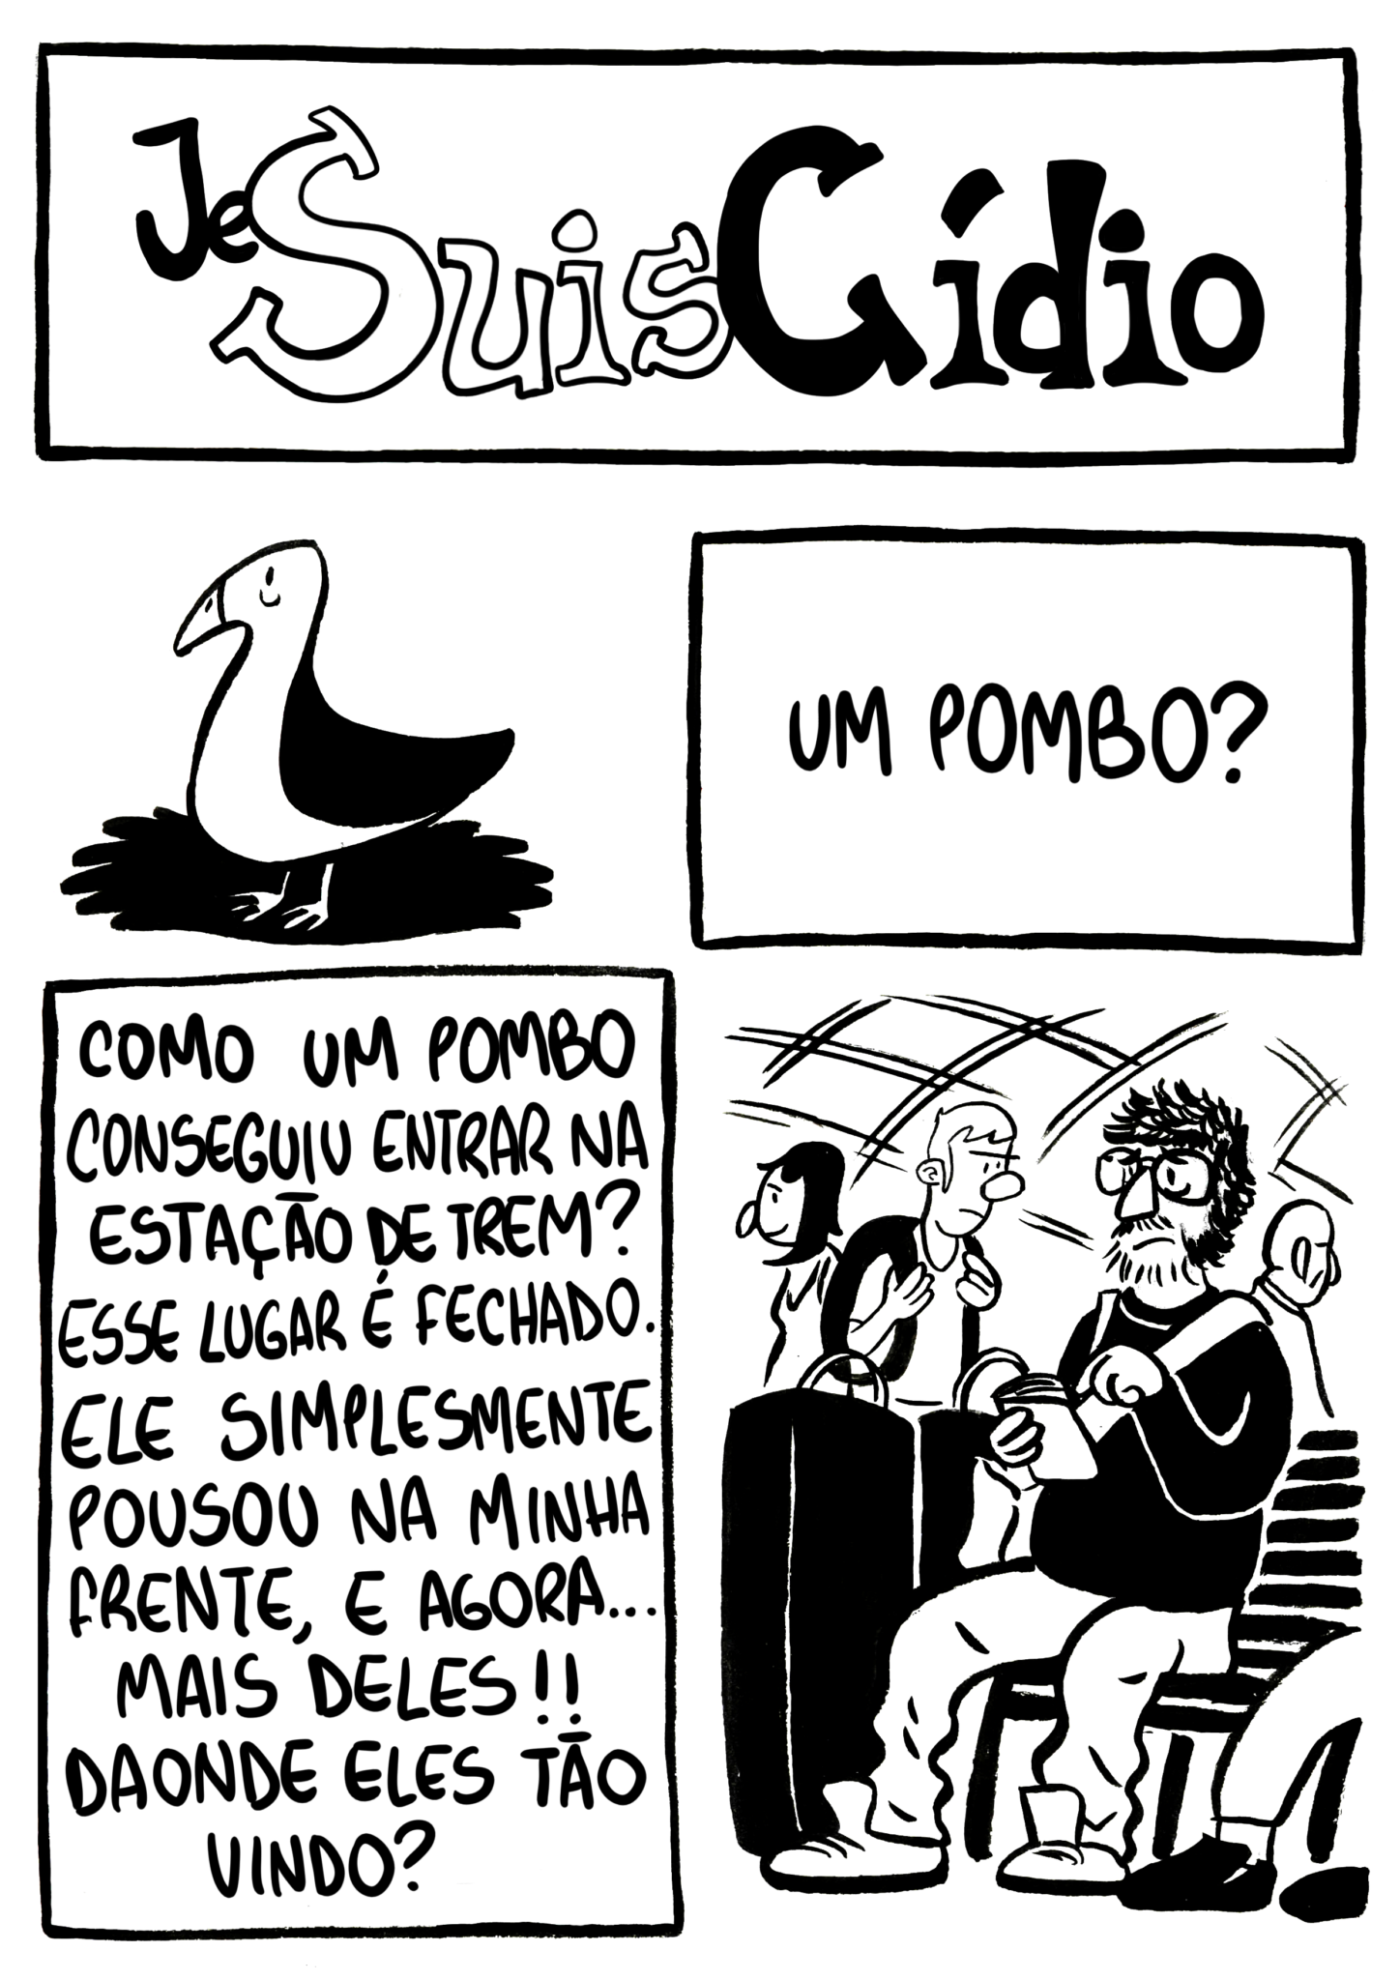 Je Suis Cídio #1, por João B. Godoi